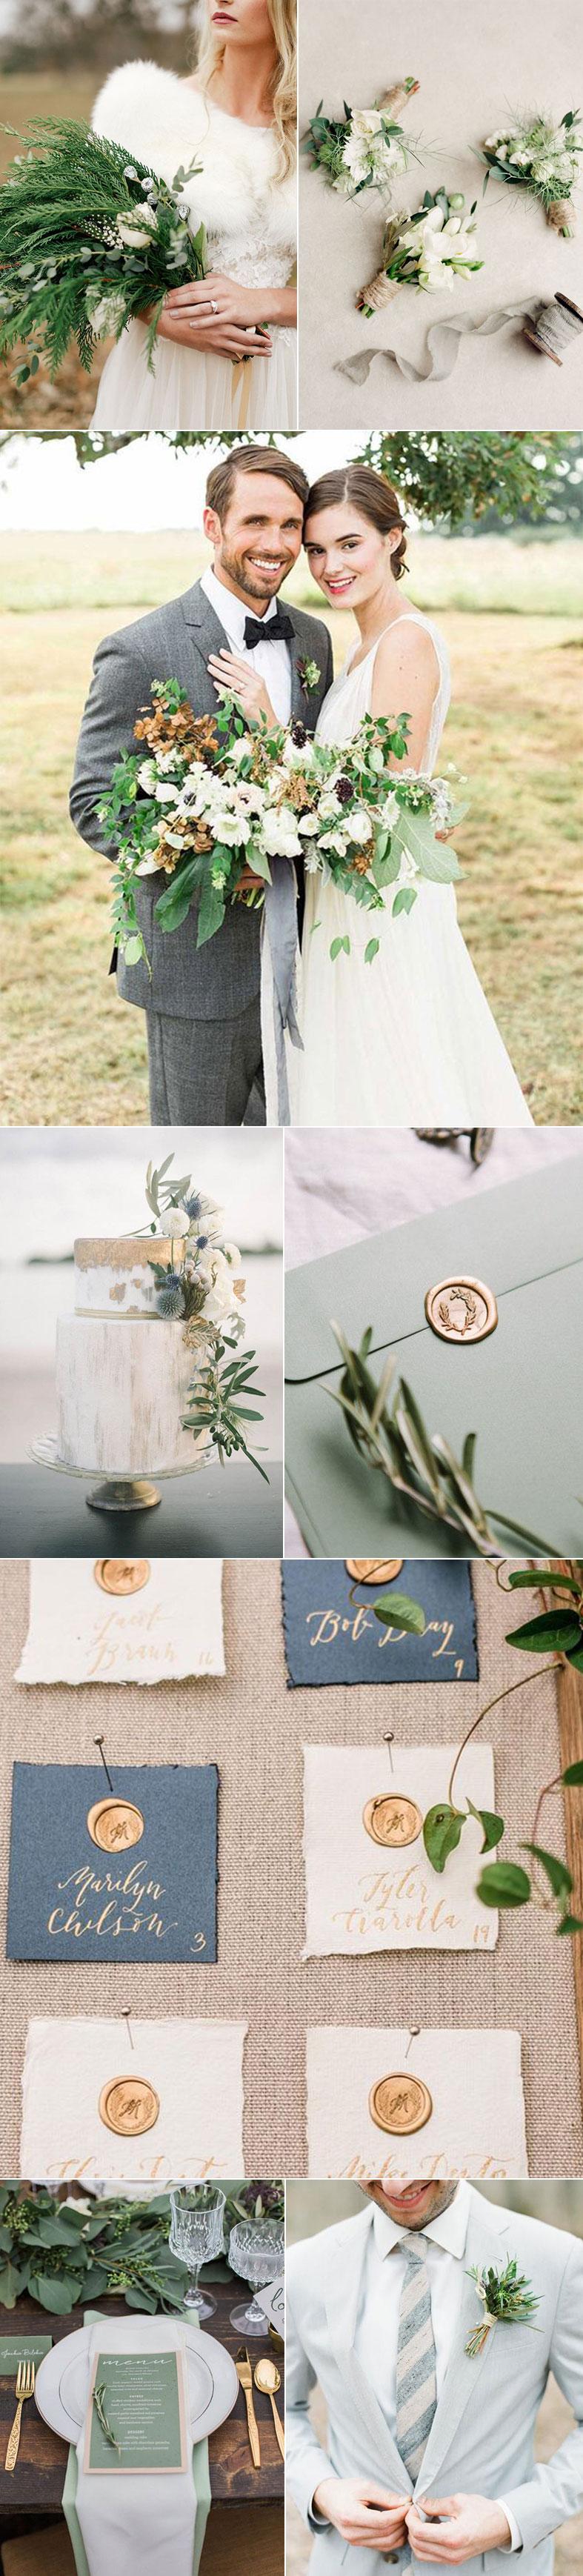 Sage + Gold Wedding